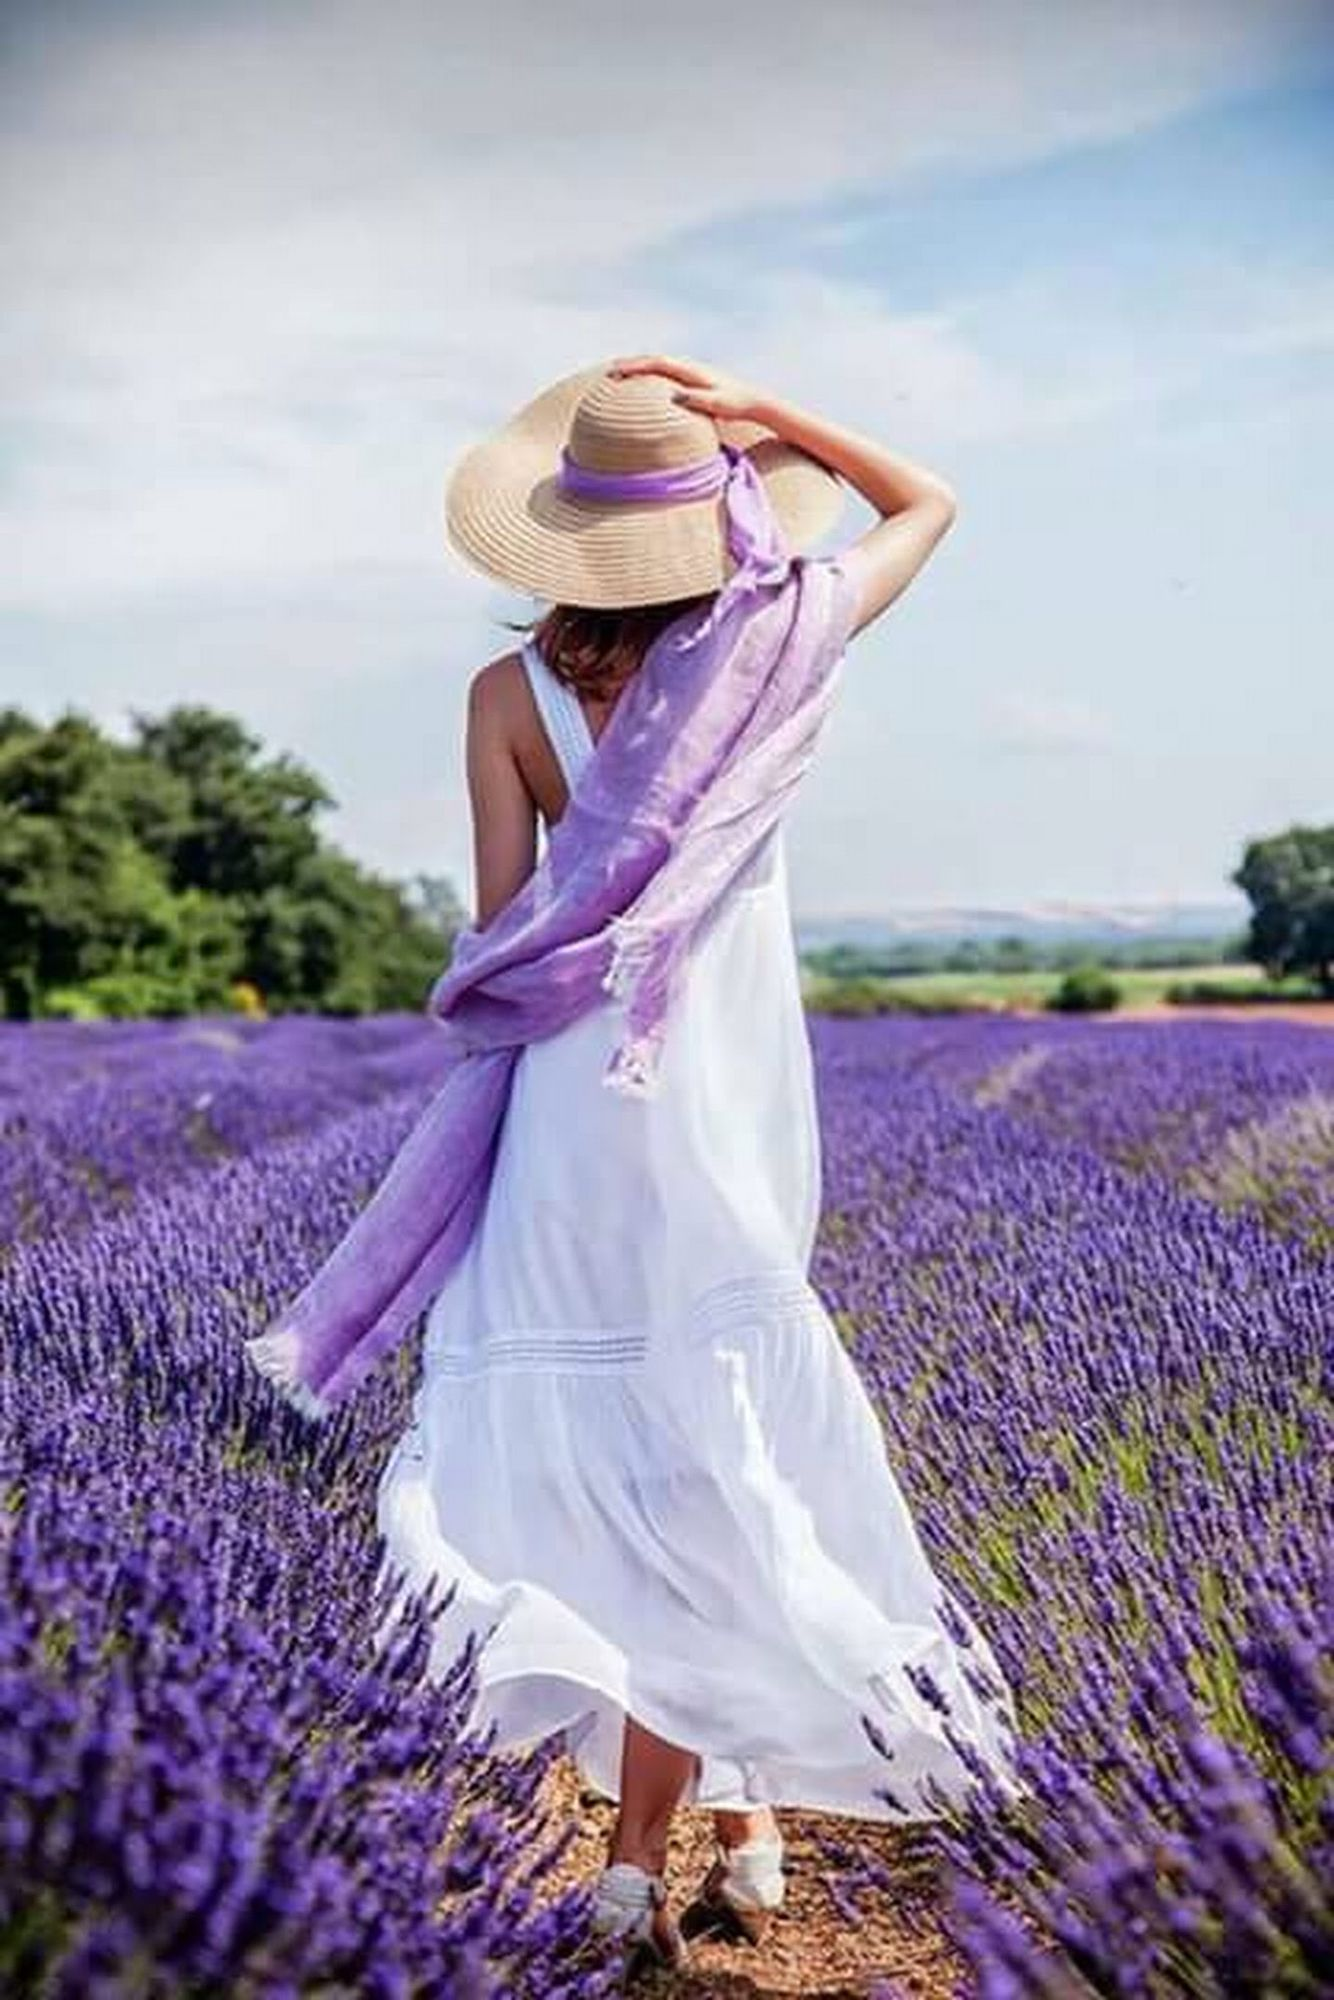 Pin By Levondas Artistic Dreams2 On Lavender Fields Pinterest